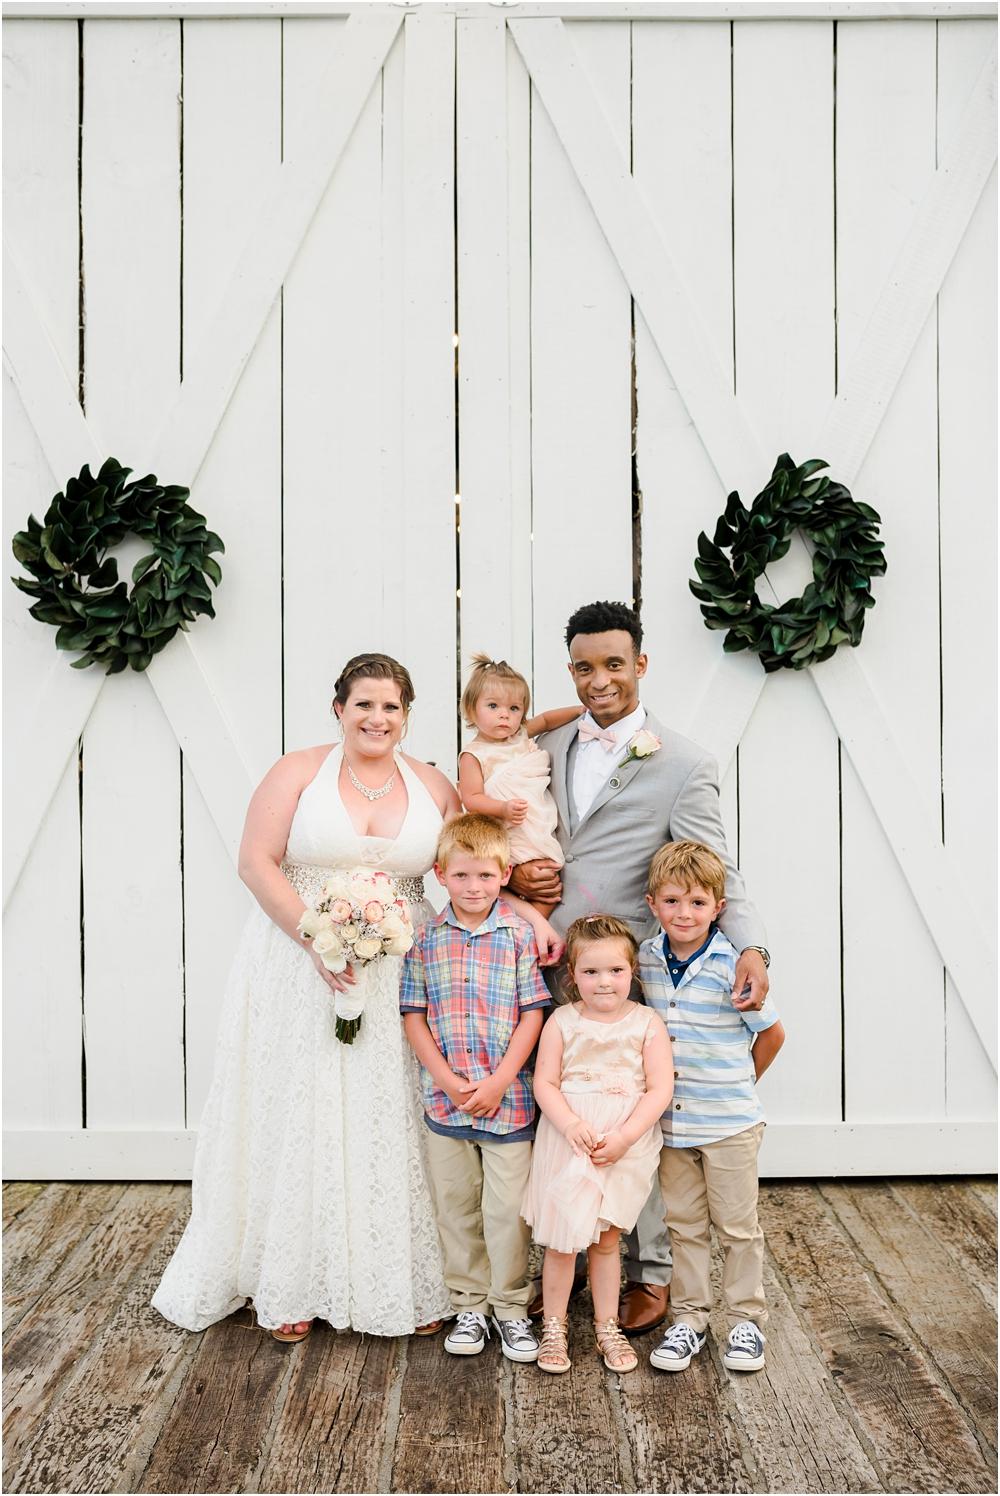 mosley-wedding-kiersten-stevenson-photography-30a-panama-city-beach-dothan-tallahassee-(257-of-472).JPG